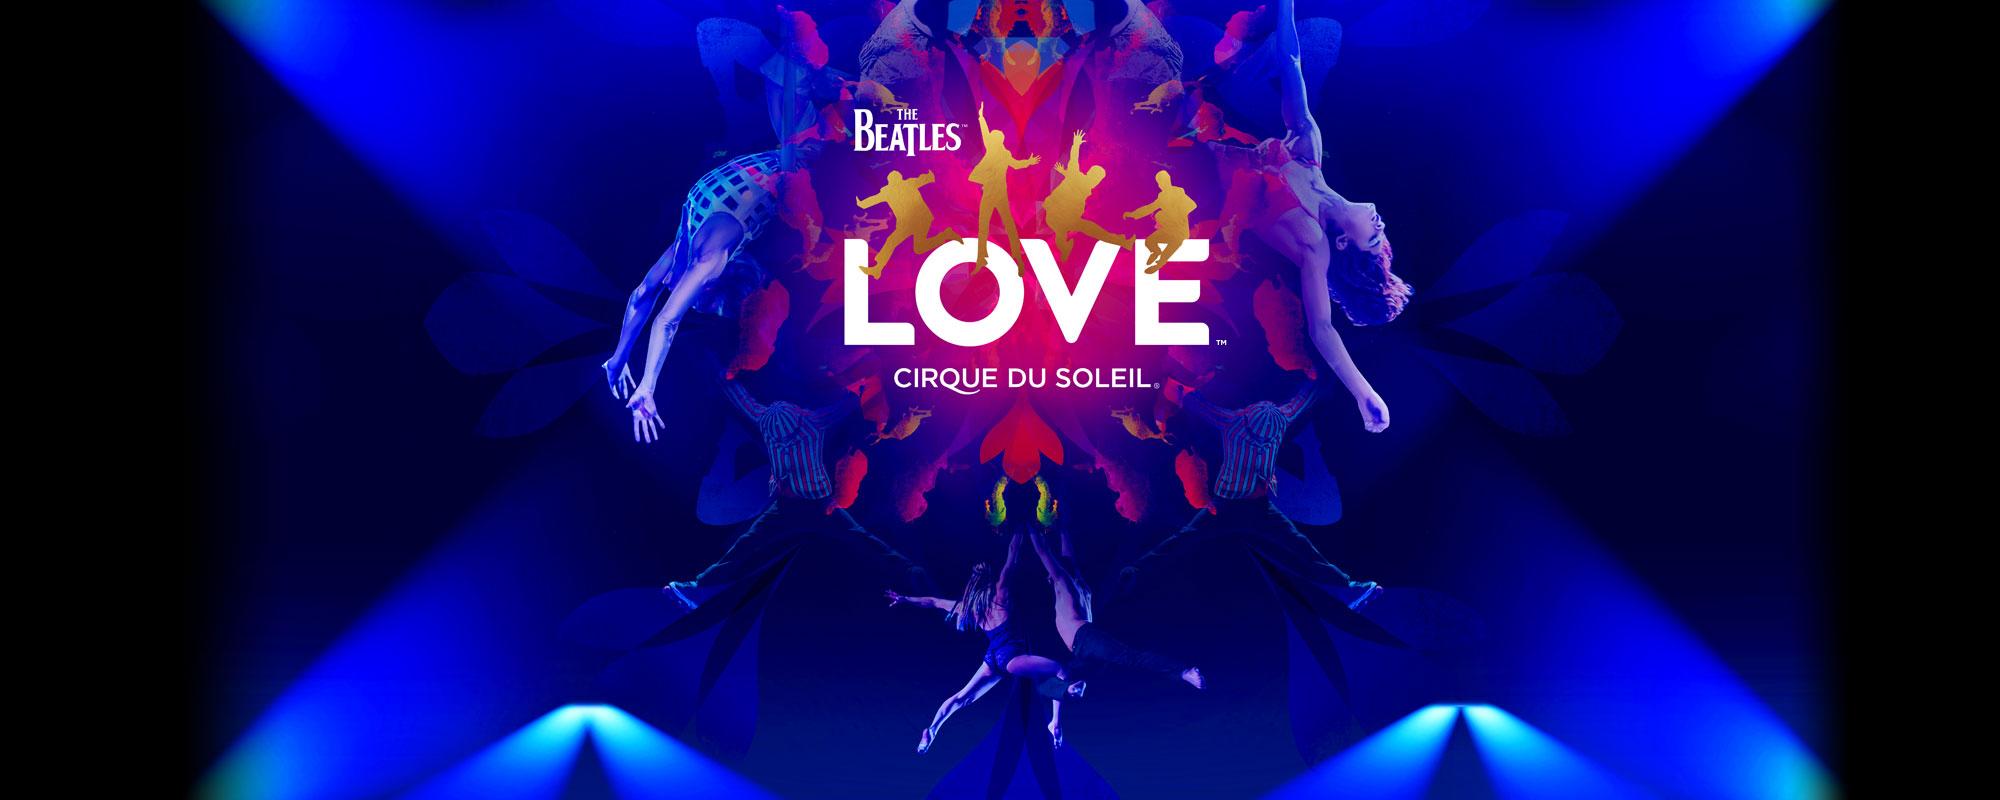 The Beatles LOVE by Cirque du Soleil show